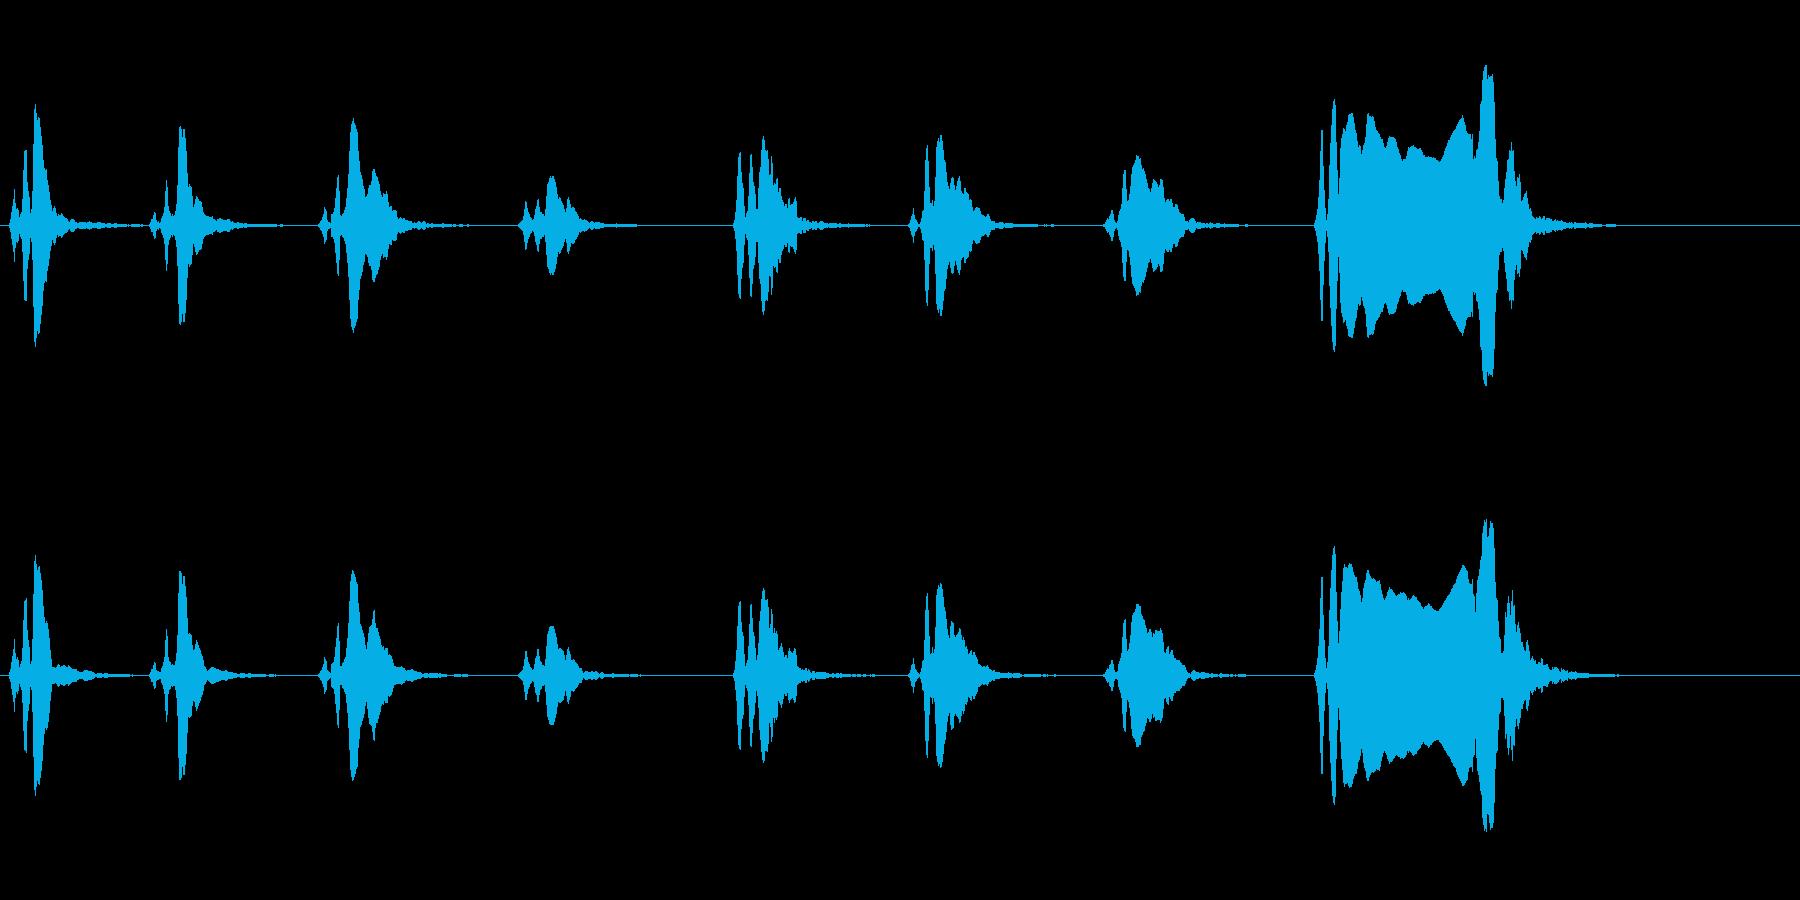 尺八 生演奏 古典風 残響音有 8の再生済みの波形